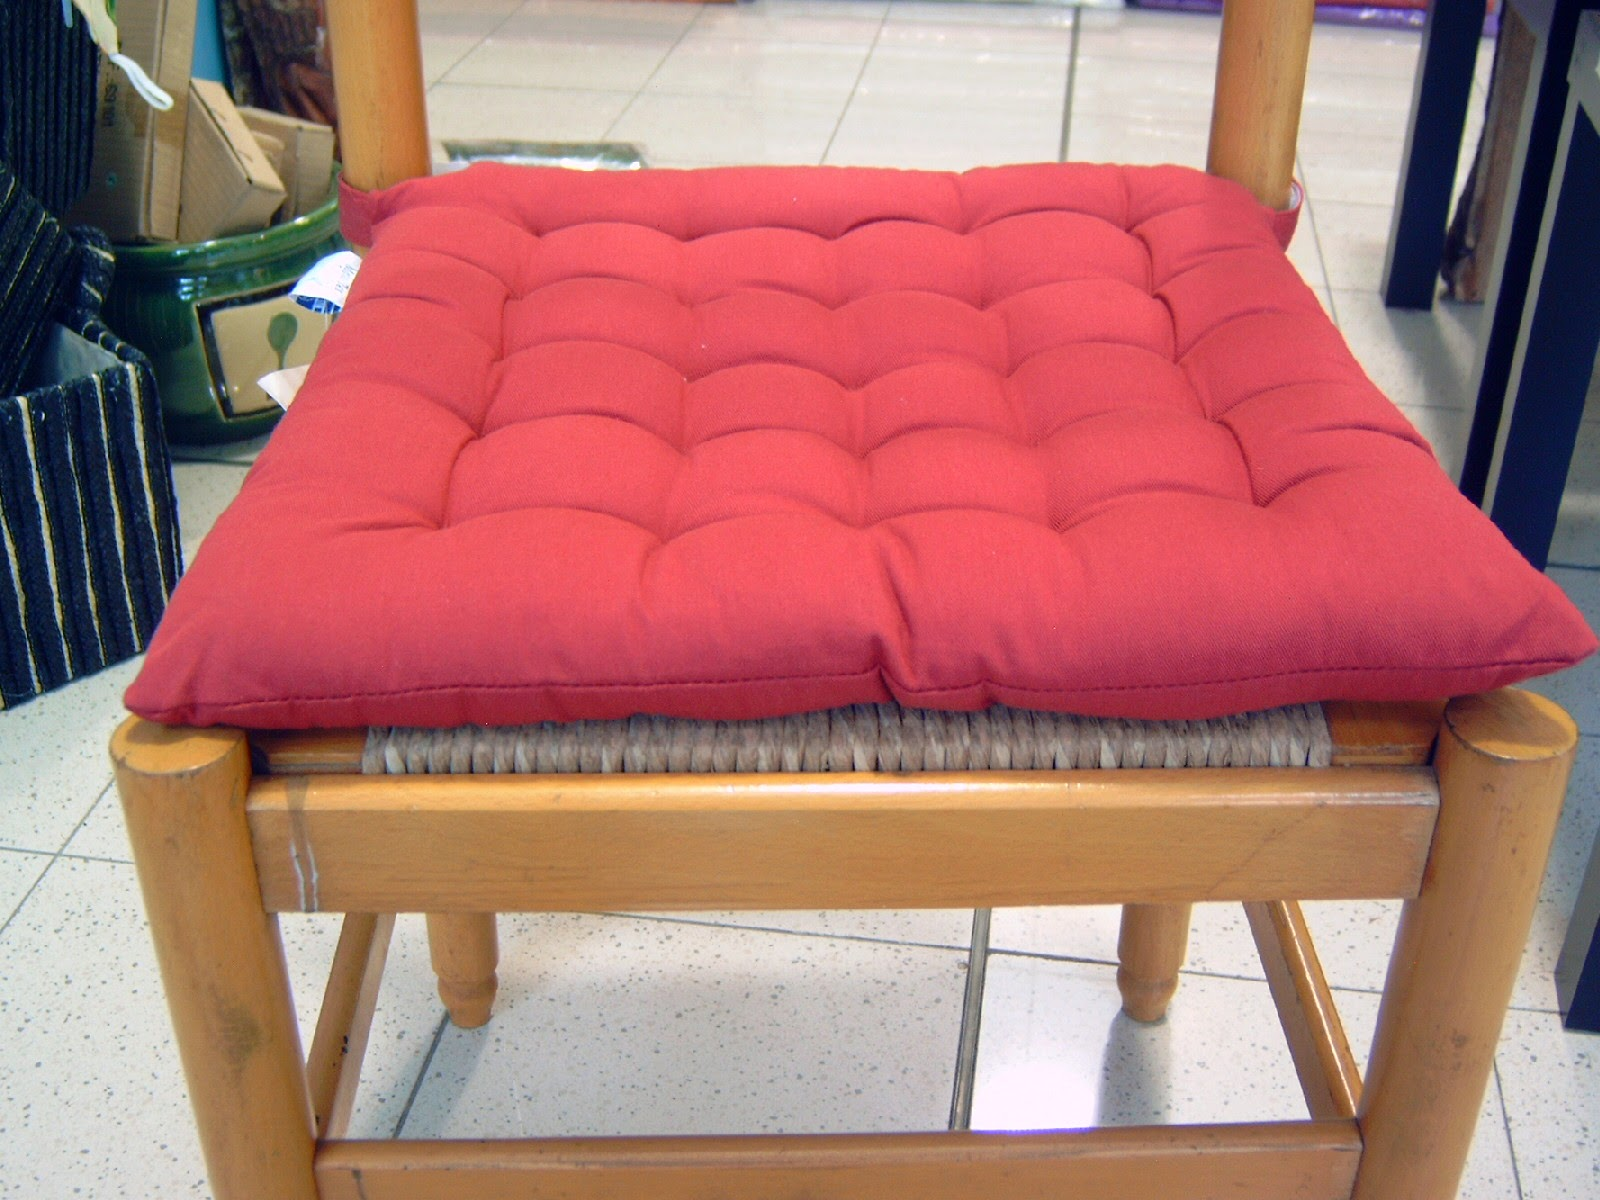 cuscini per le sedie rotondi | Passatoie Cucina Moderne in Bamboo